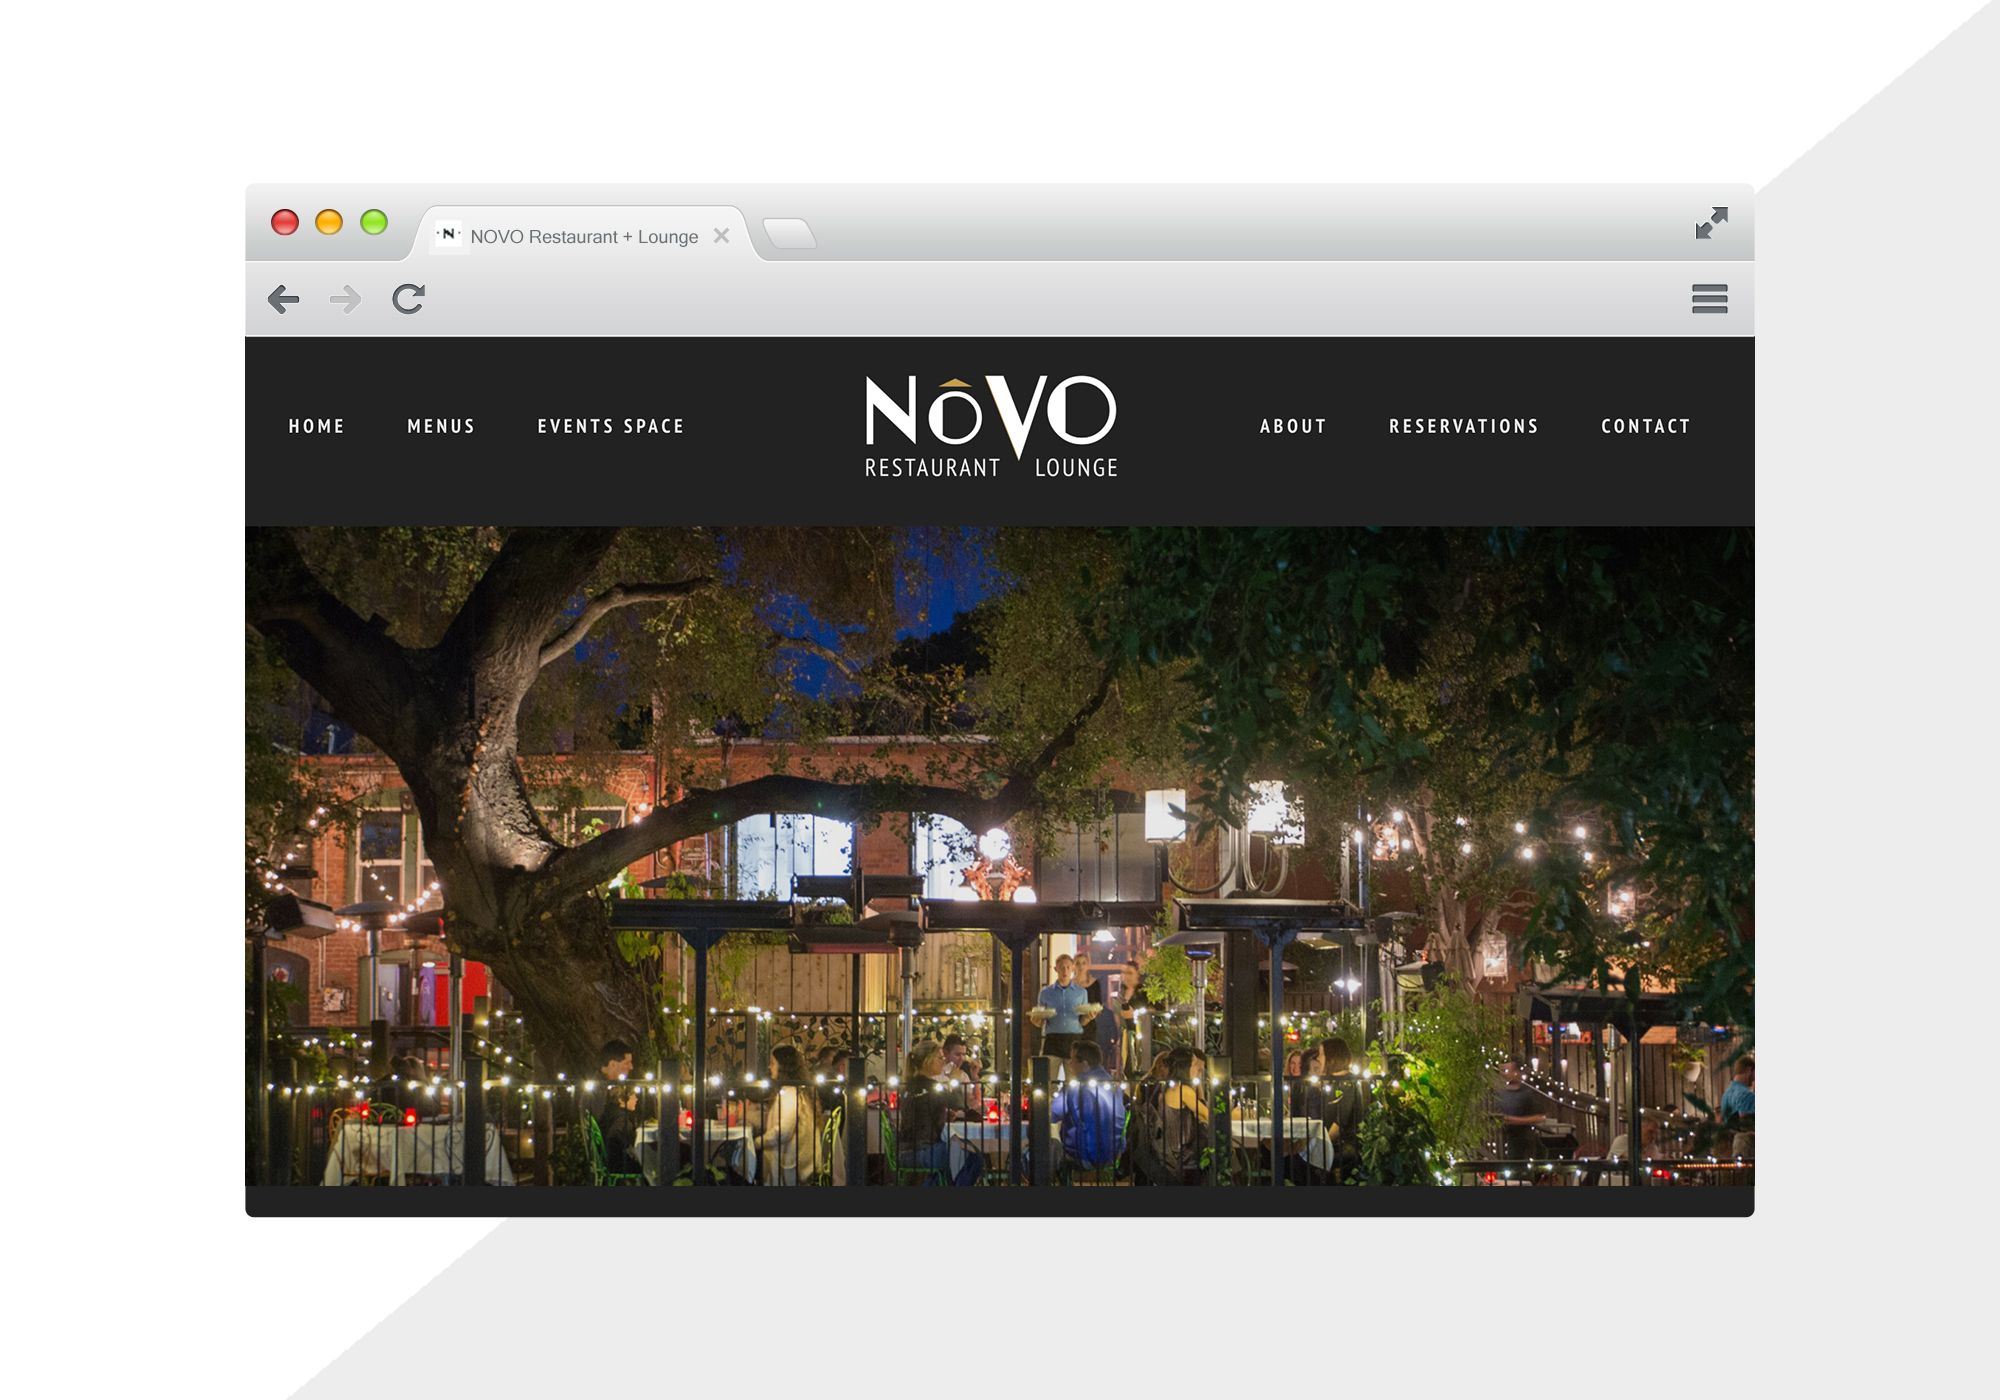 novo-restuaruant-Browser-Mockup.jpg